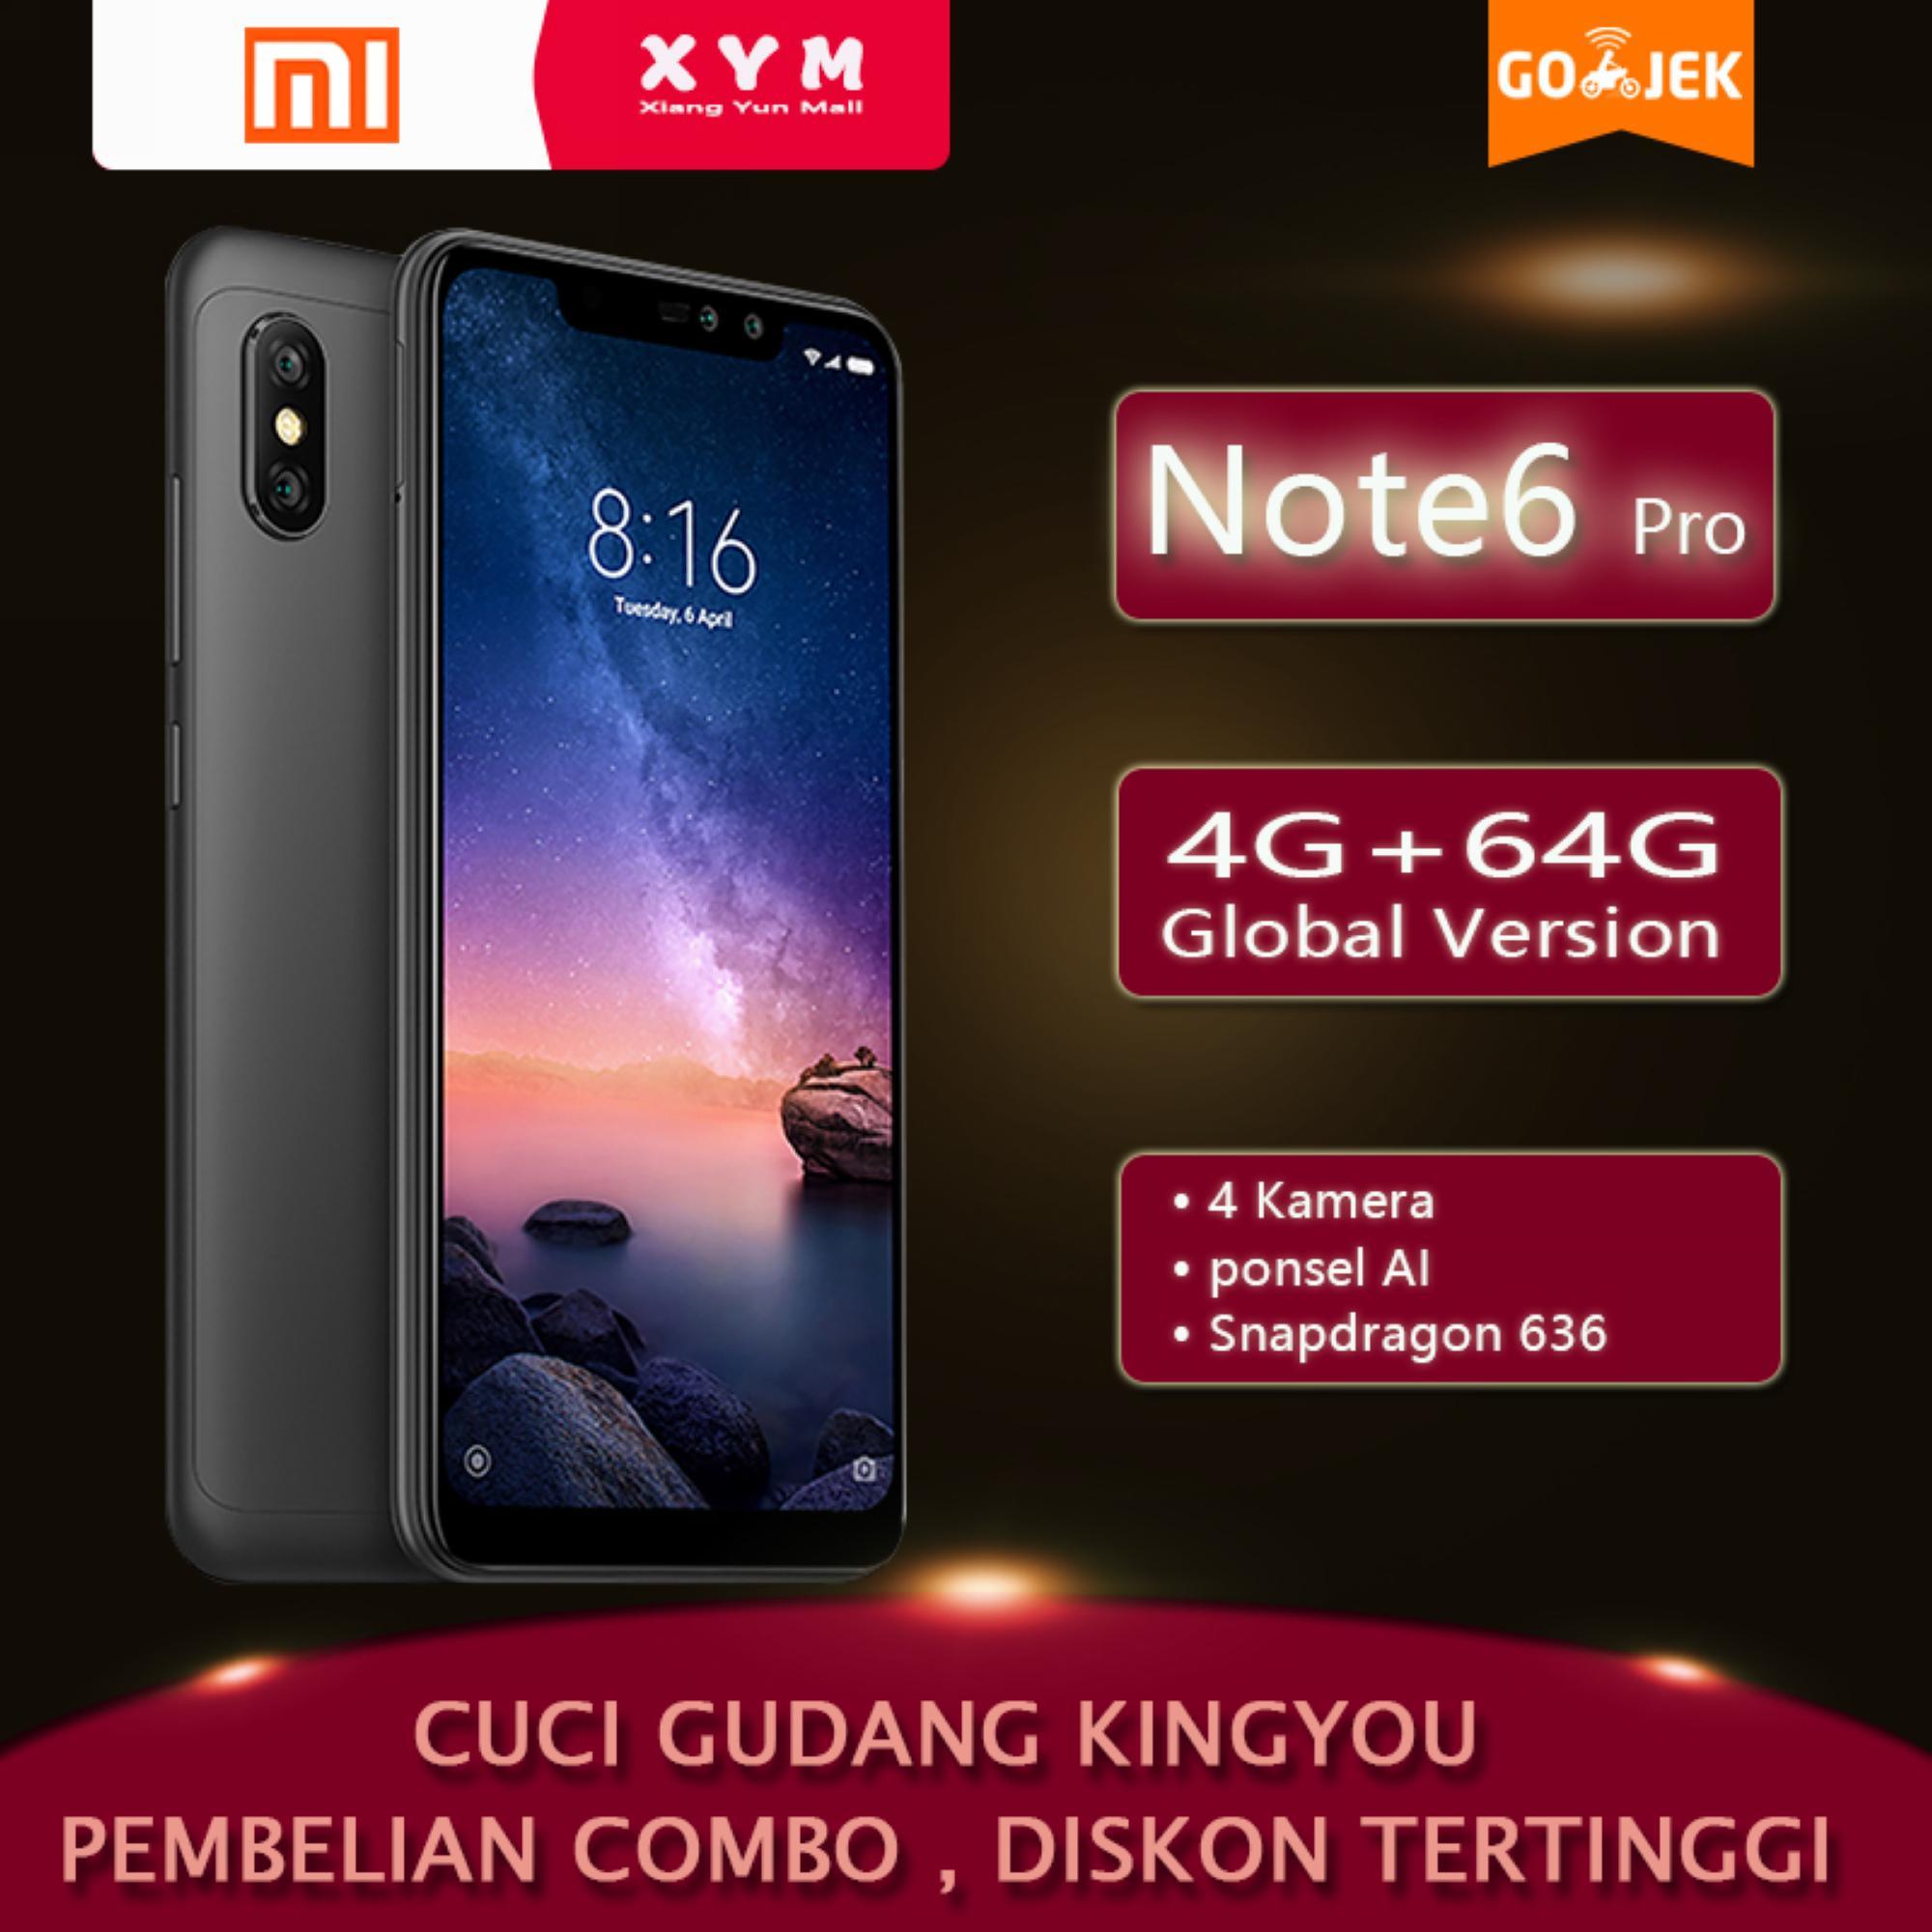 Xiaomi Redmi Note 6 pro - 4G/64G Edisi global Snapdragon 636 ponsel AI